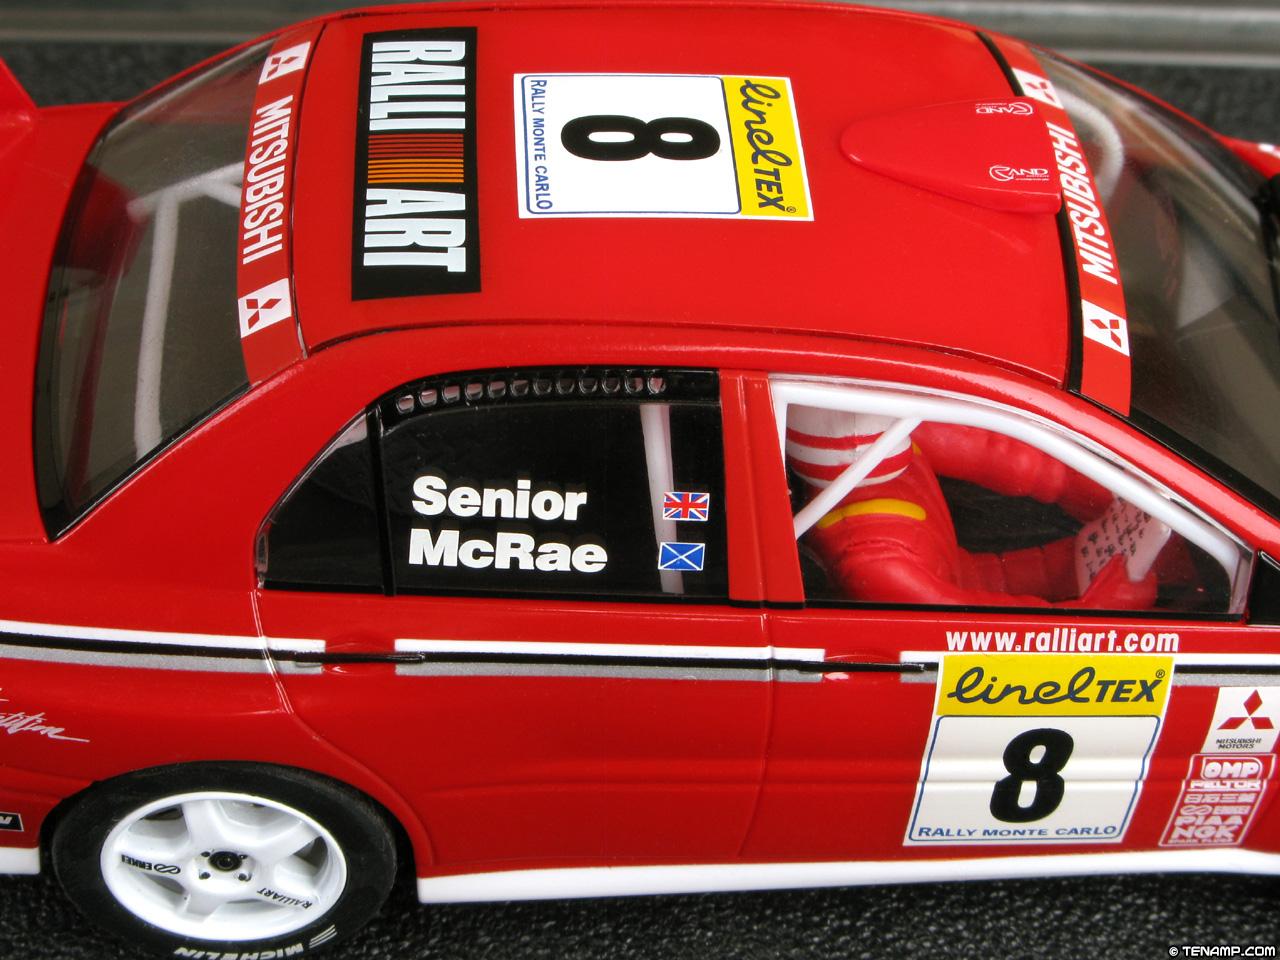 Scalextric C2364 Mitsubishi Lancer WRC - Alistair McRae 2002